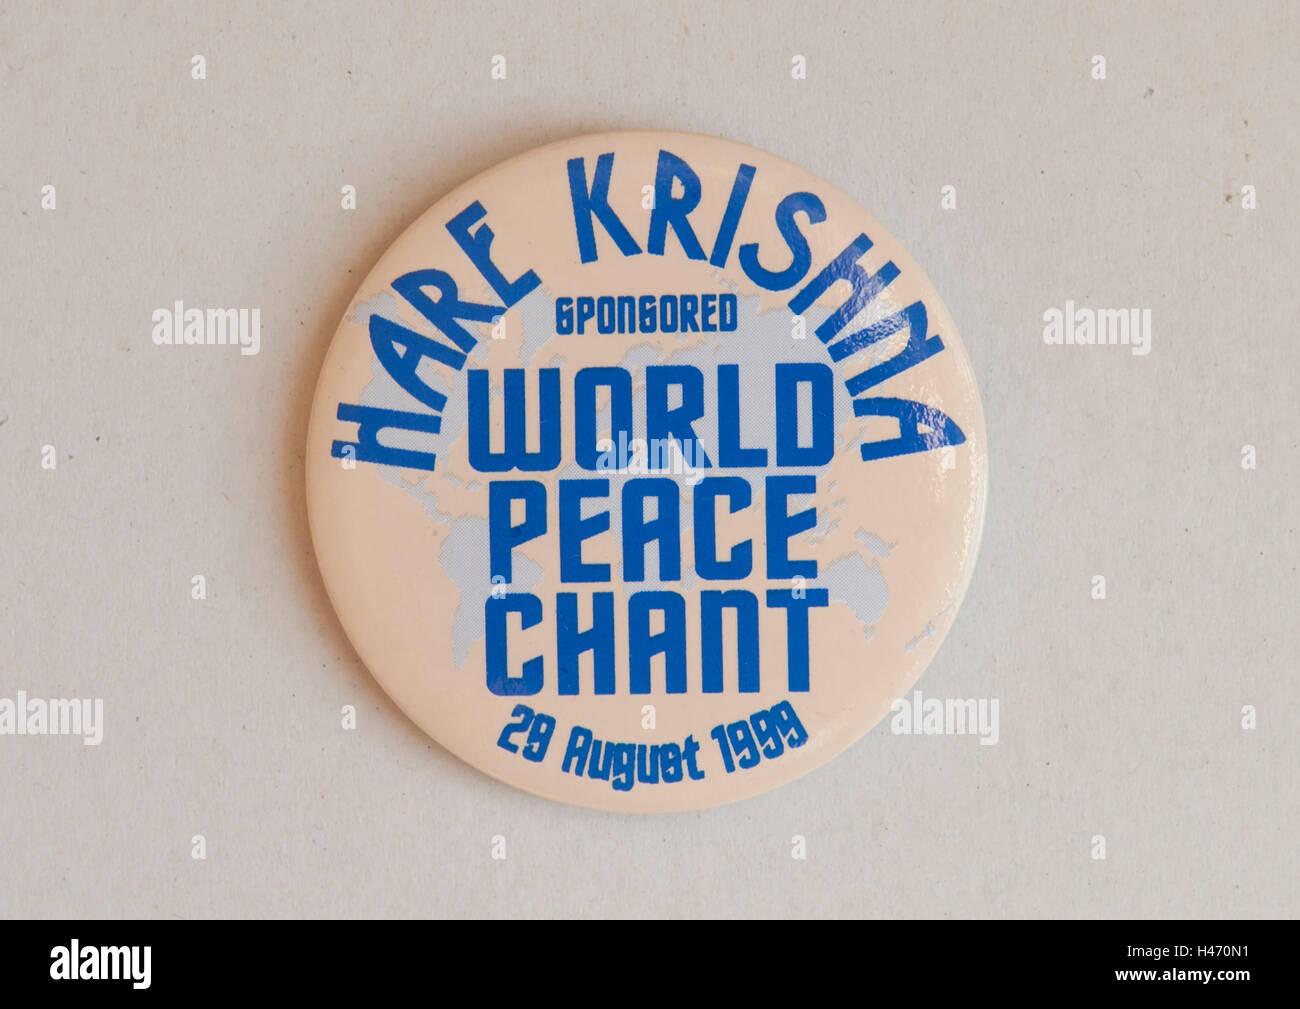 Hare Krishna sponsored World Peace Chant 28 August 1989 London Uk HOMER SYKES - Stock Image